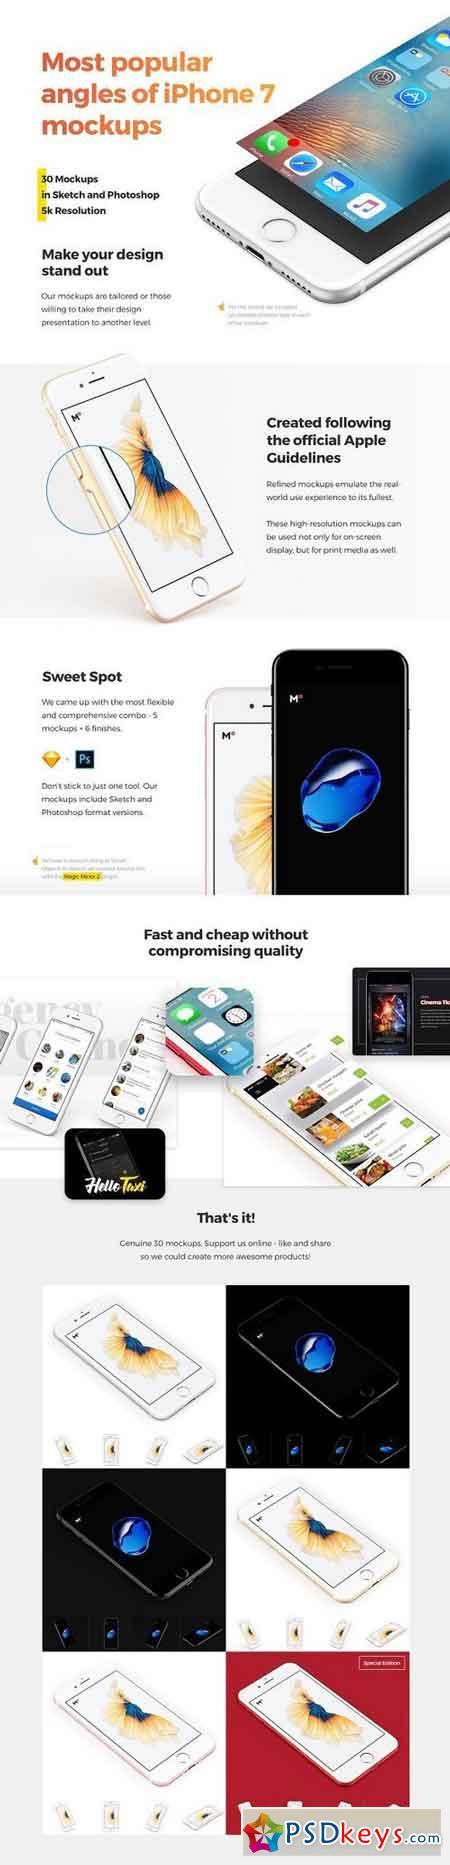 Most Popular iPhone 7 Mockups 1417012